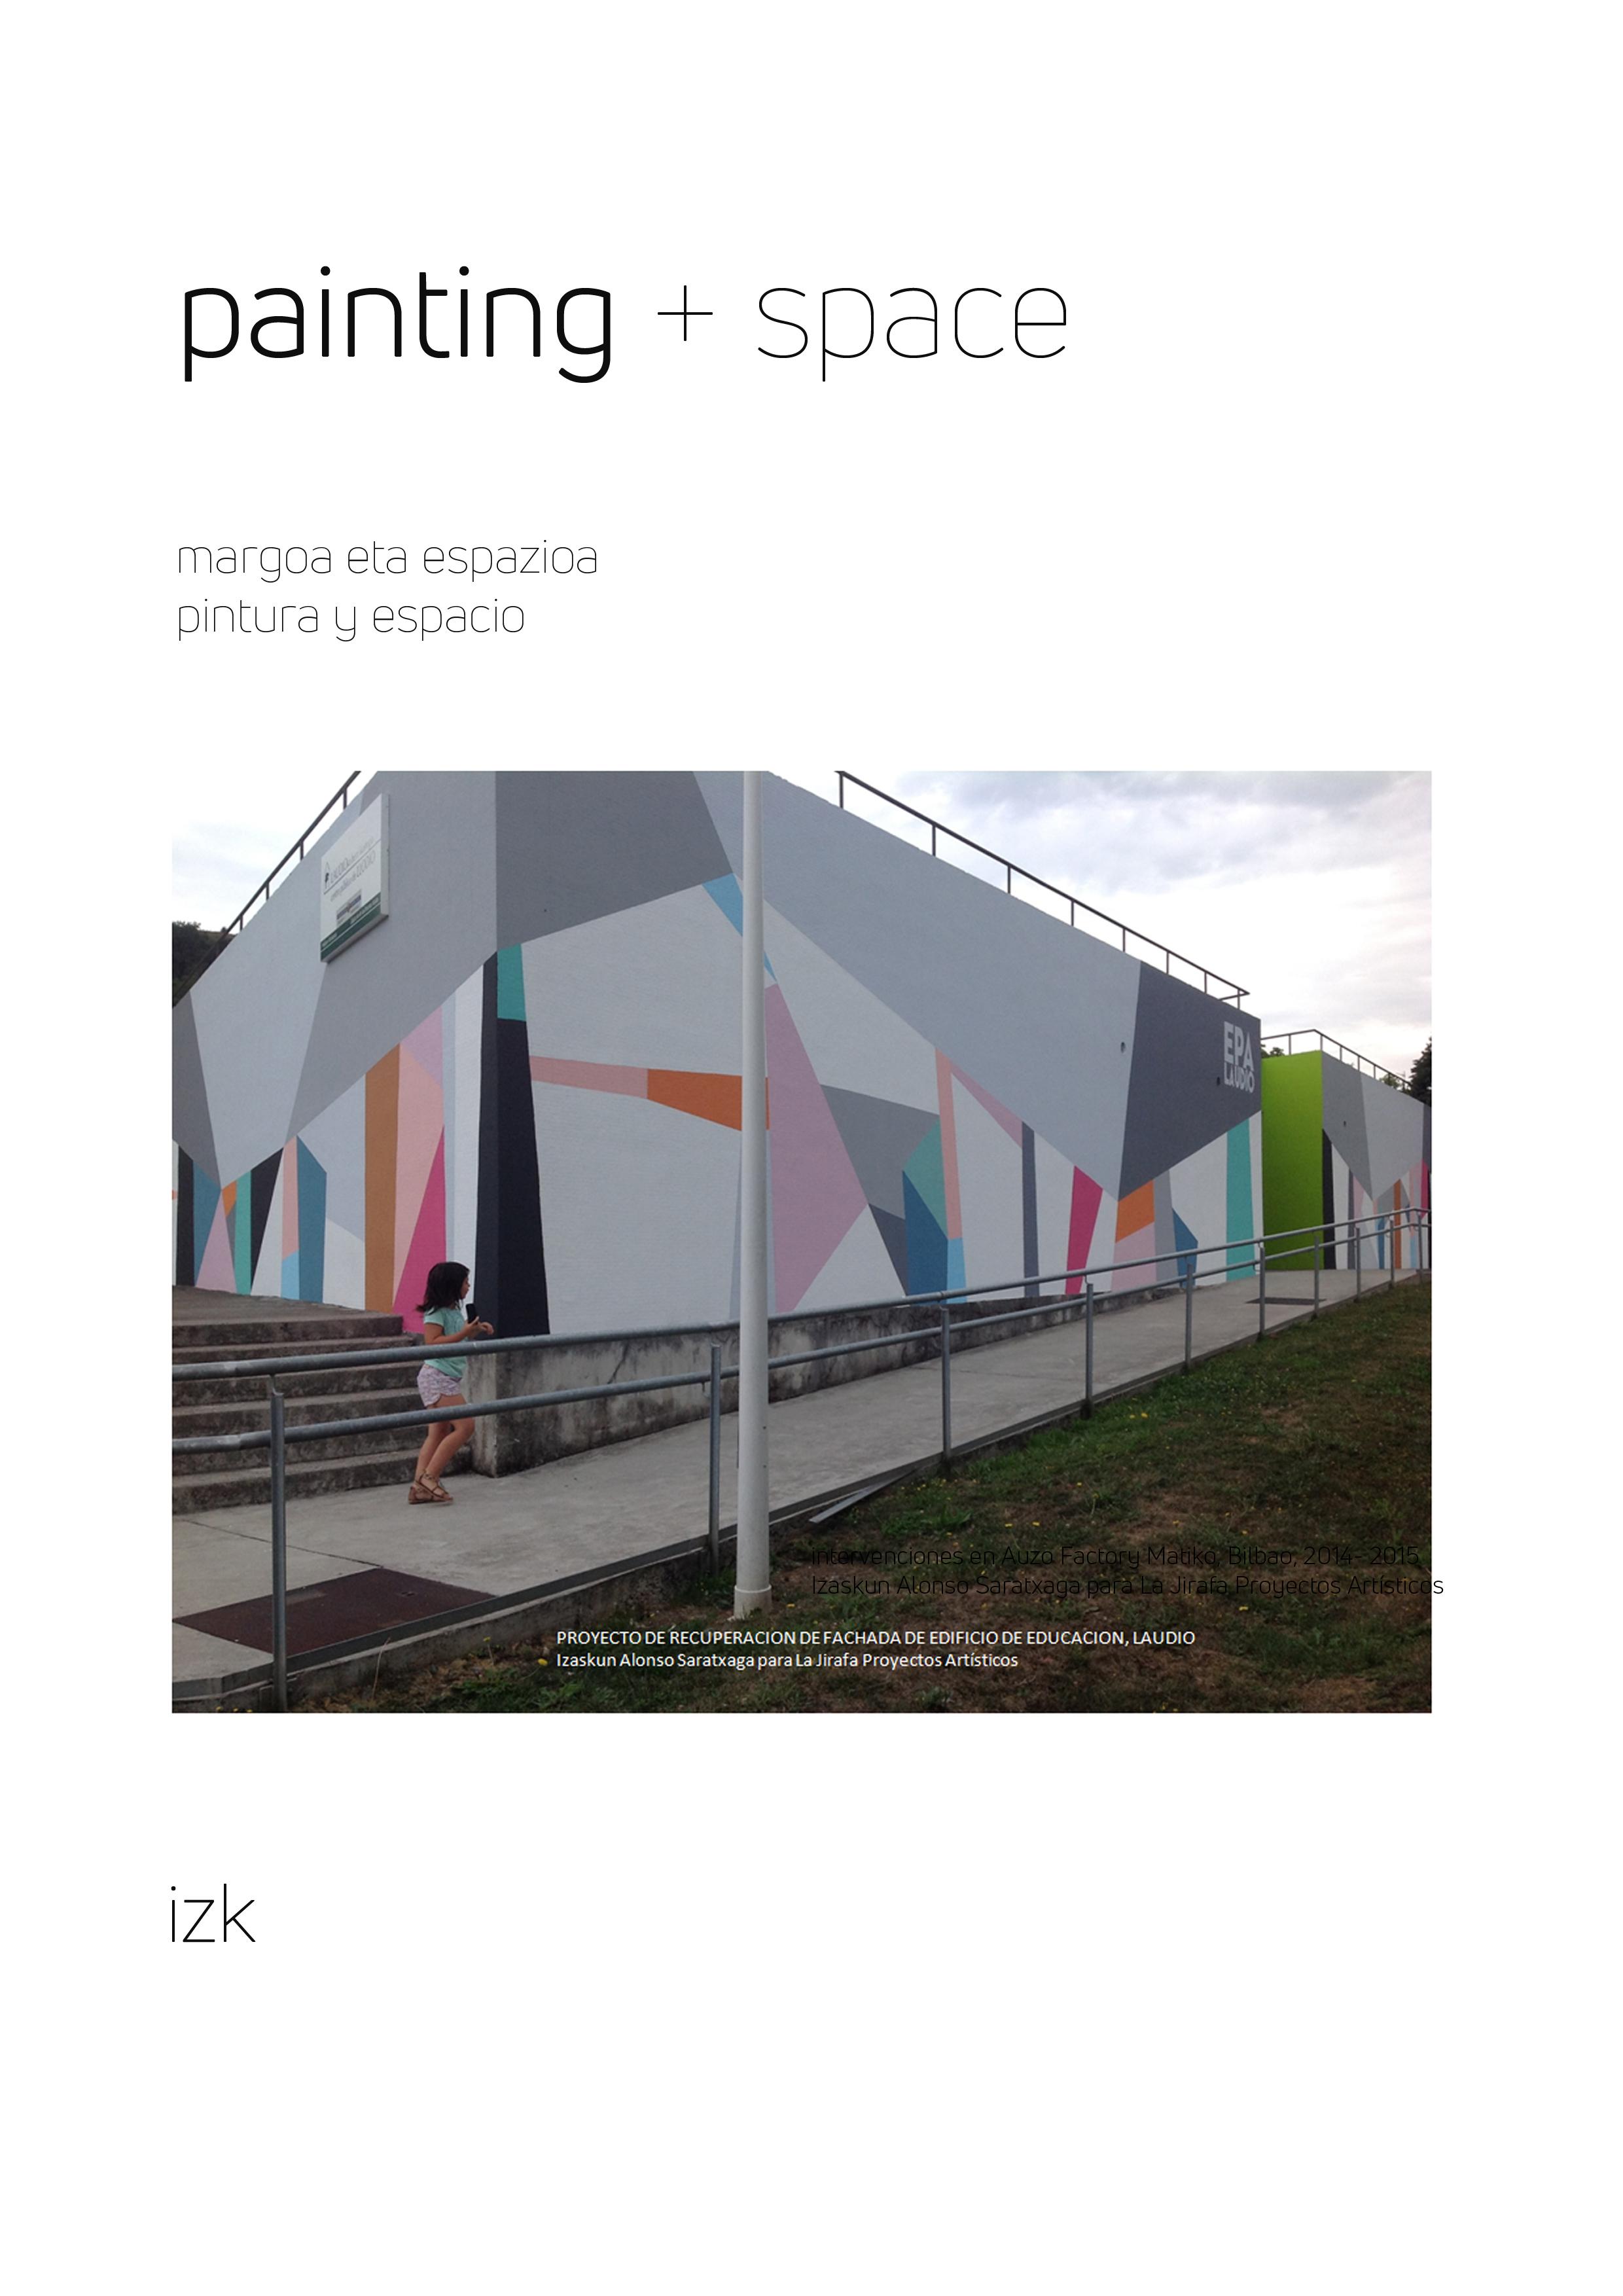 Pinturas que transforman lugares by Izaskun Alonso Saratxaga - Creative Work